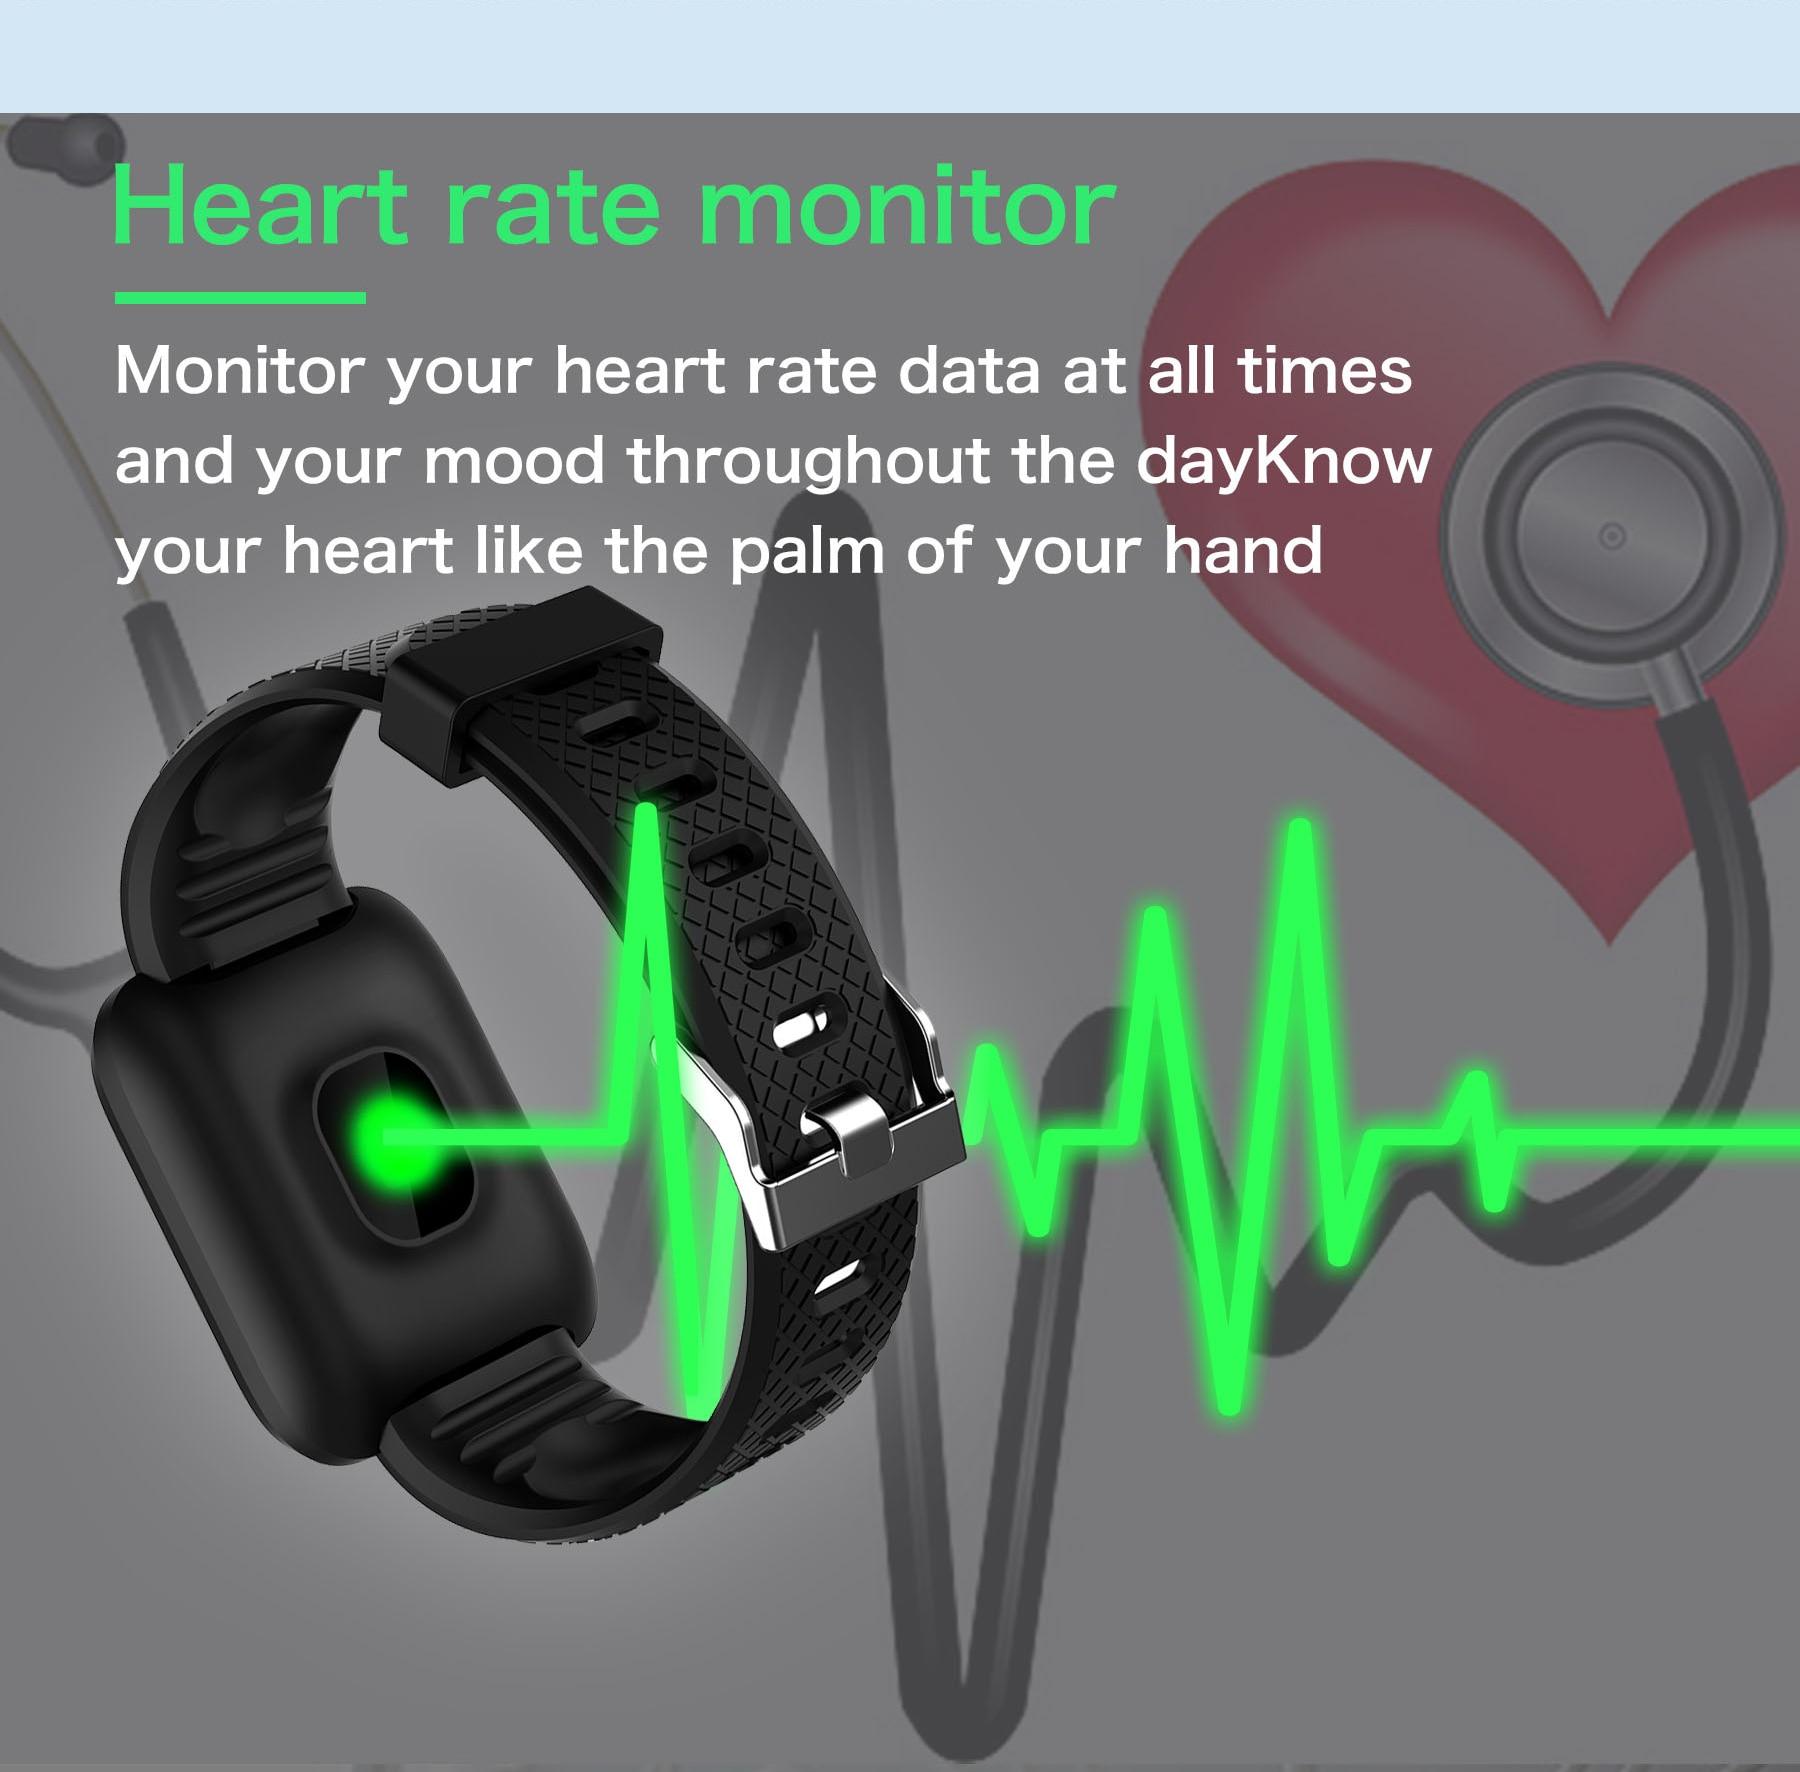 HTB1hQNpRrPpK1RjSZFFq6y5PpXai Doolnng Smart band wristband Sport fitness Tracker bracelet Heart Rate Monitor blood Pressure measurement Smartband Watch